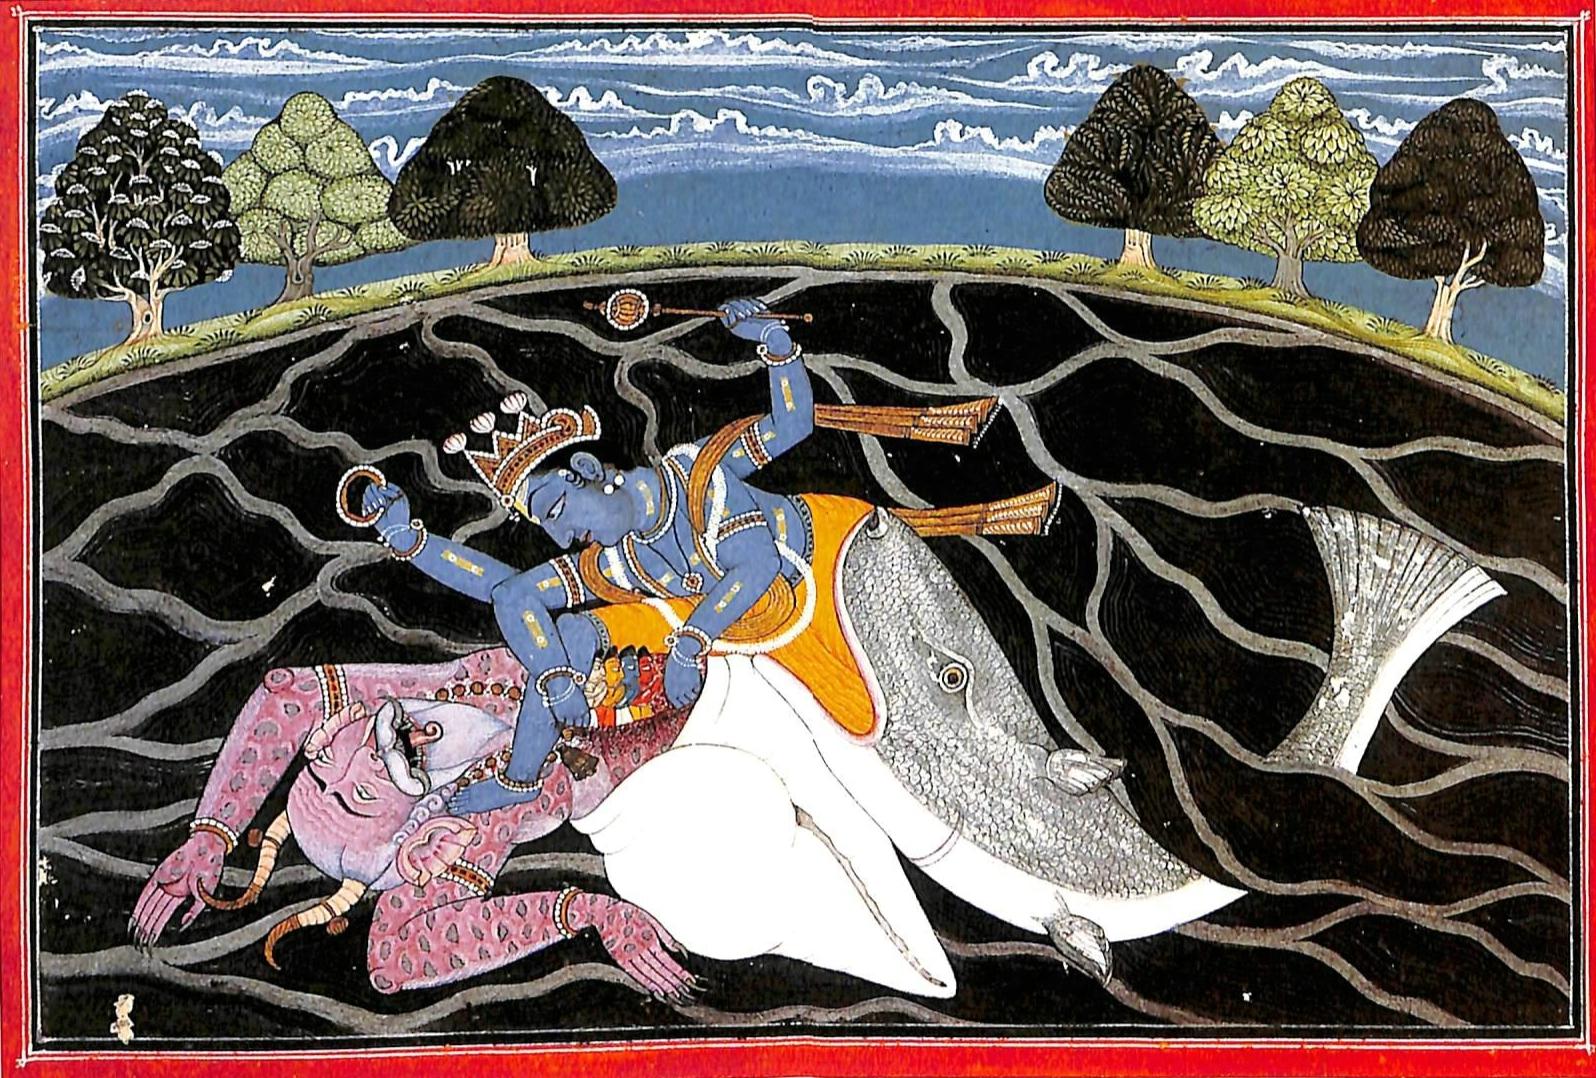 File:Matsya, the Fish-Incarnation of Vishnu.jpg - Wikimedia Commons